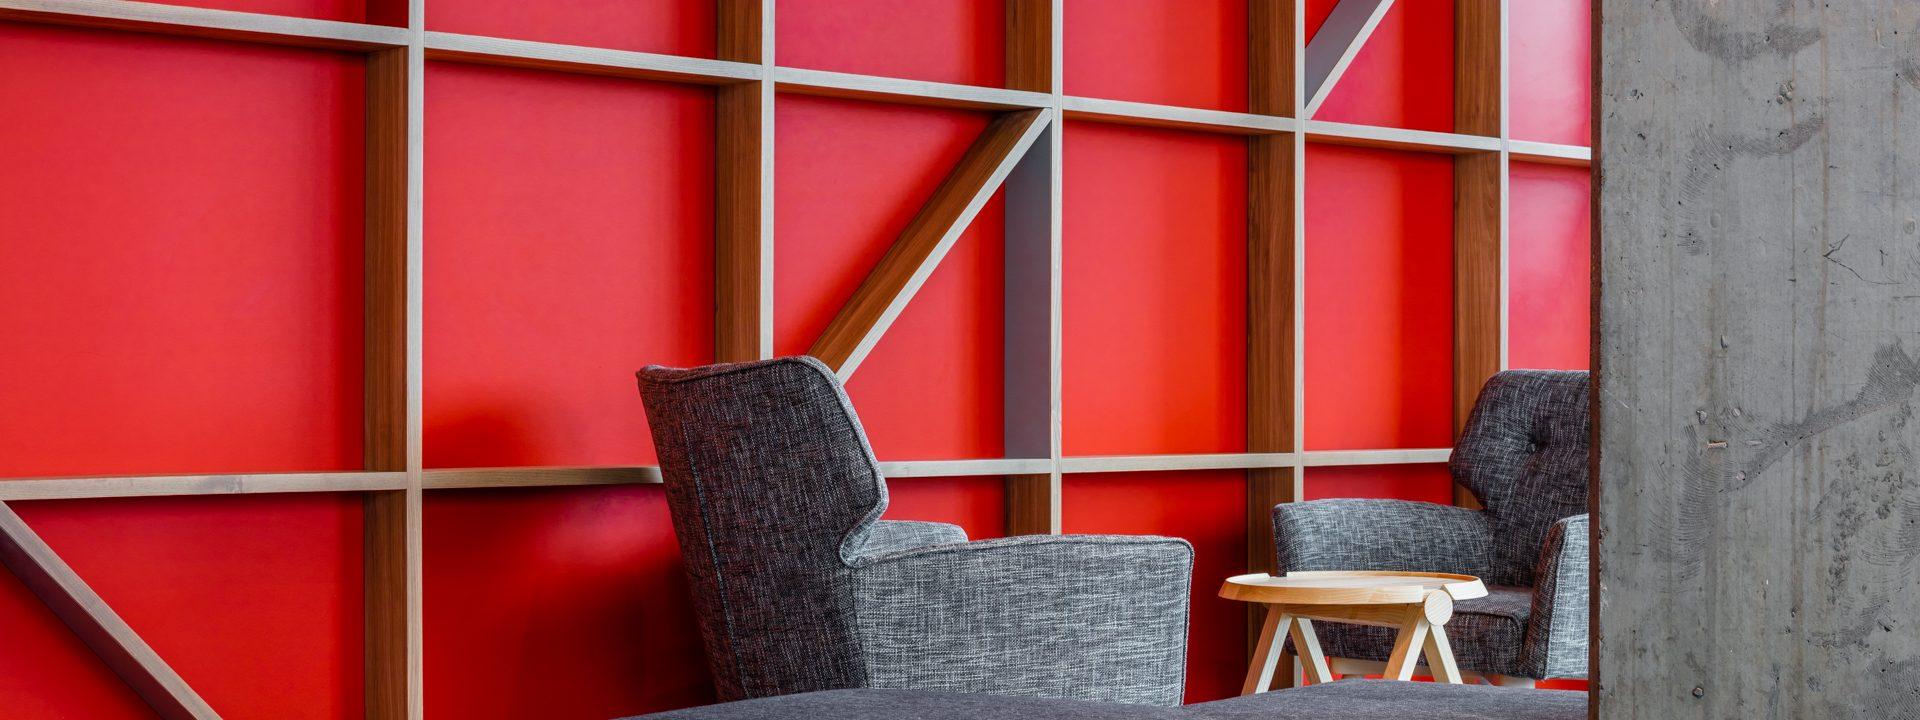 Groupe Germain opens hotel #17: Alt Hotel Calgary East Village